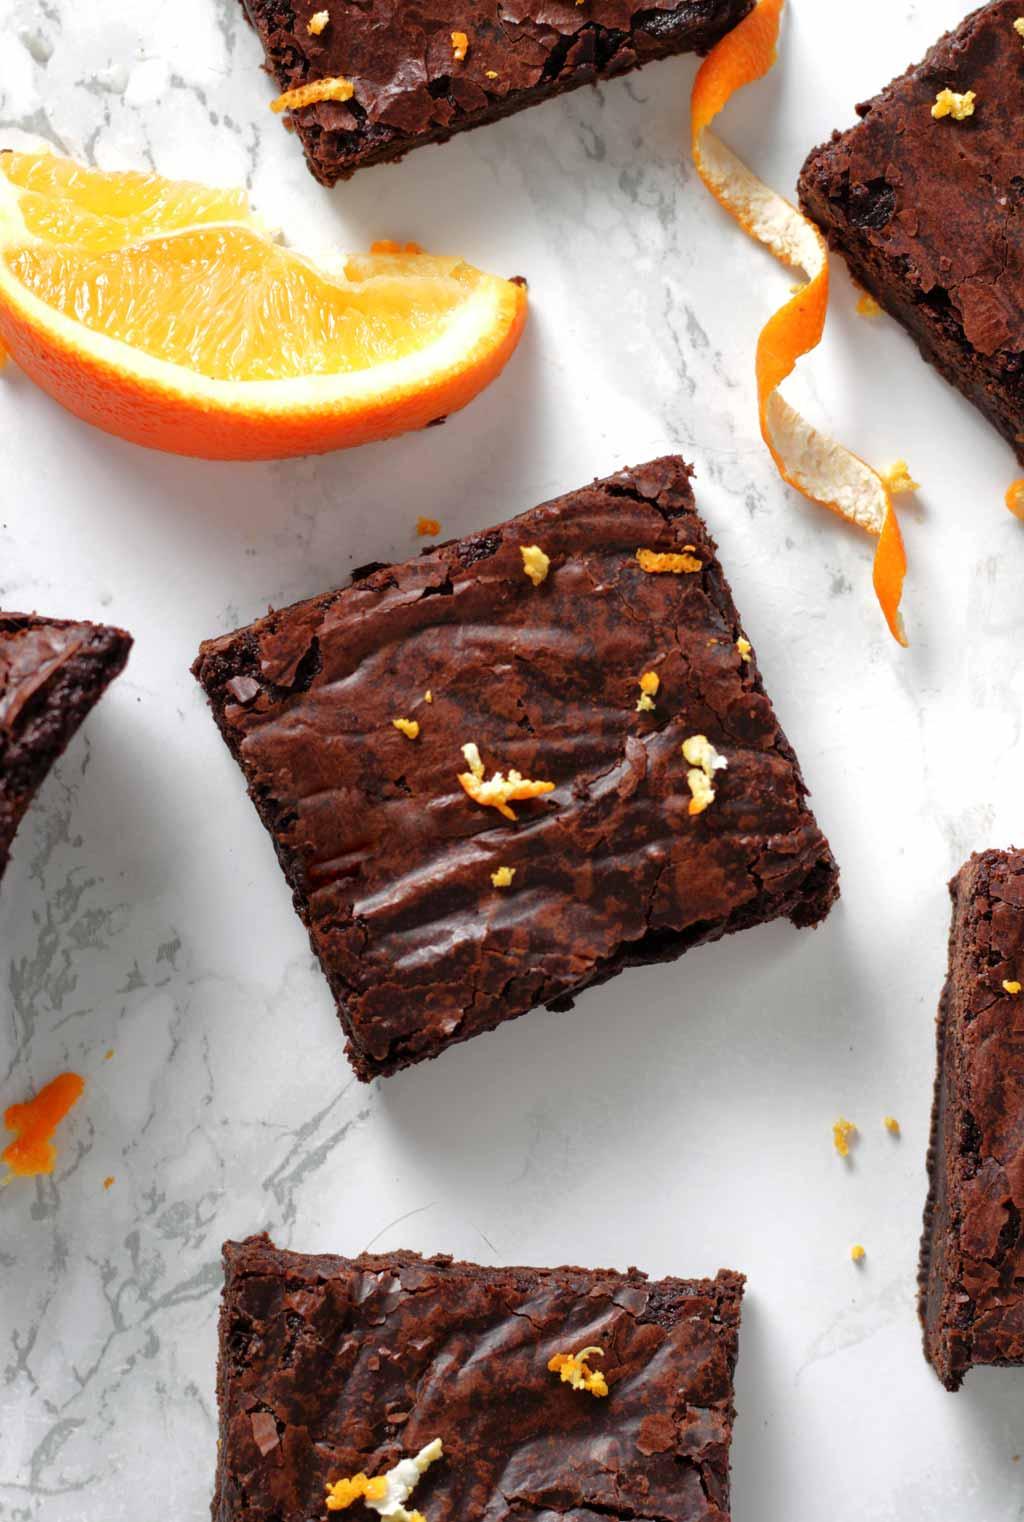 Overhead Shot Of Vegan Chocolate Orange Brownies And A Wedge Of Orange